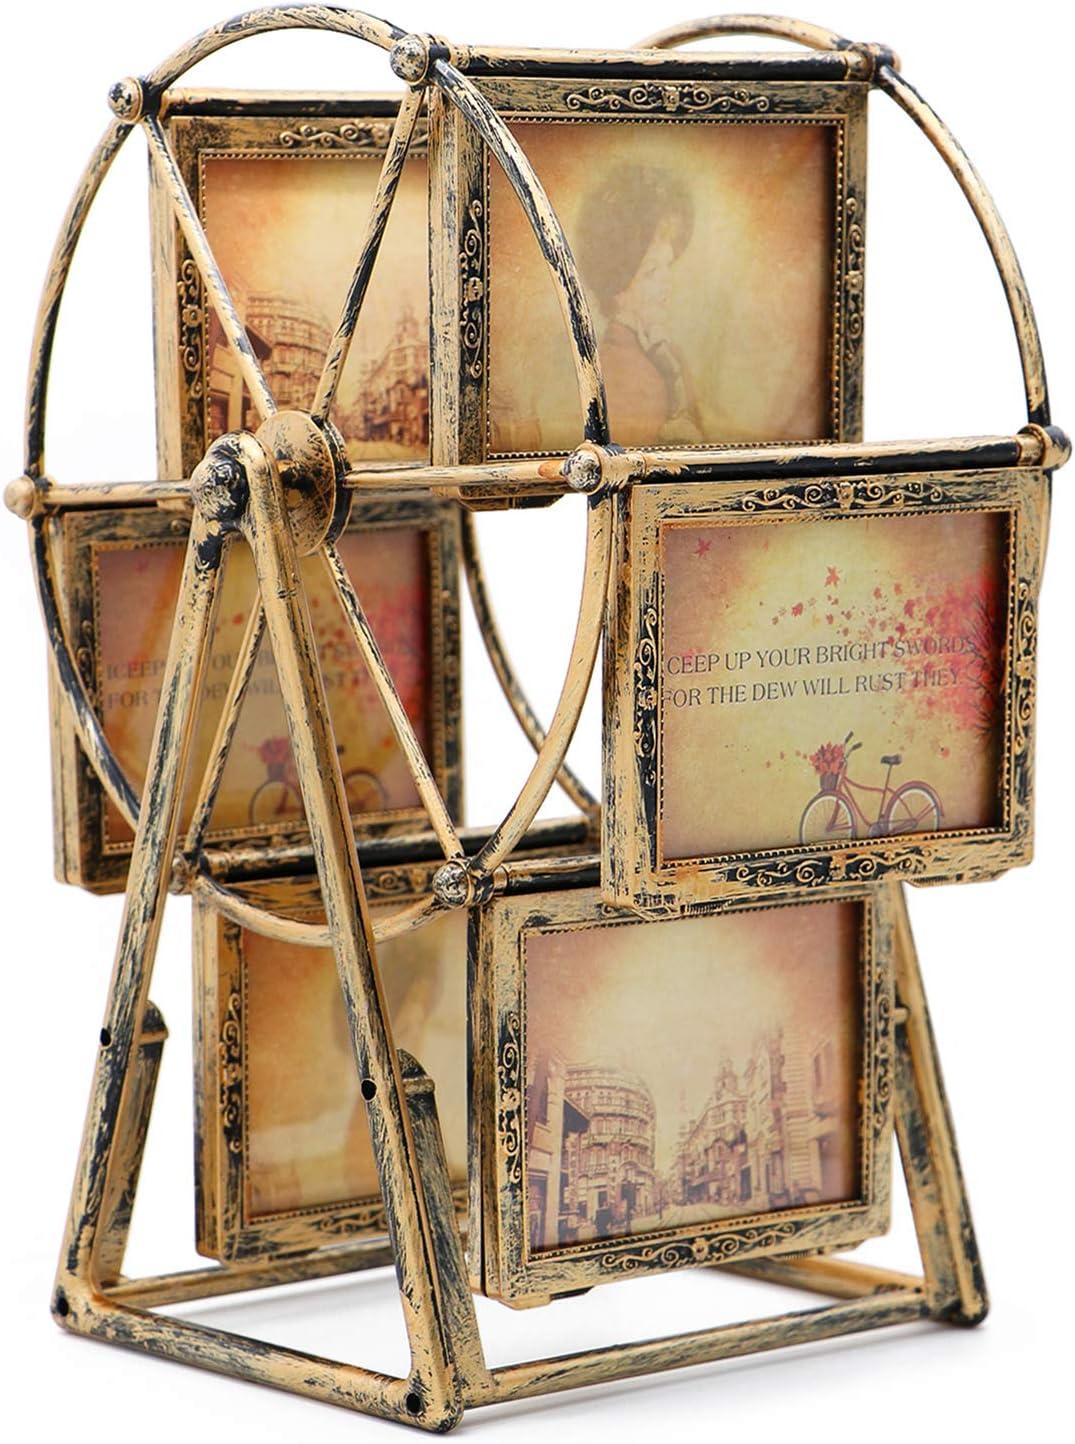 MLADEN Retro Vintage Family Photo Frame DIY Ferris Wheel Rotatable Windmill Picture Frames 5x3.5 inch Home Decor Gift Nostalgic Style (Brown)